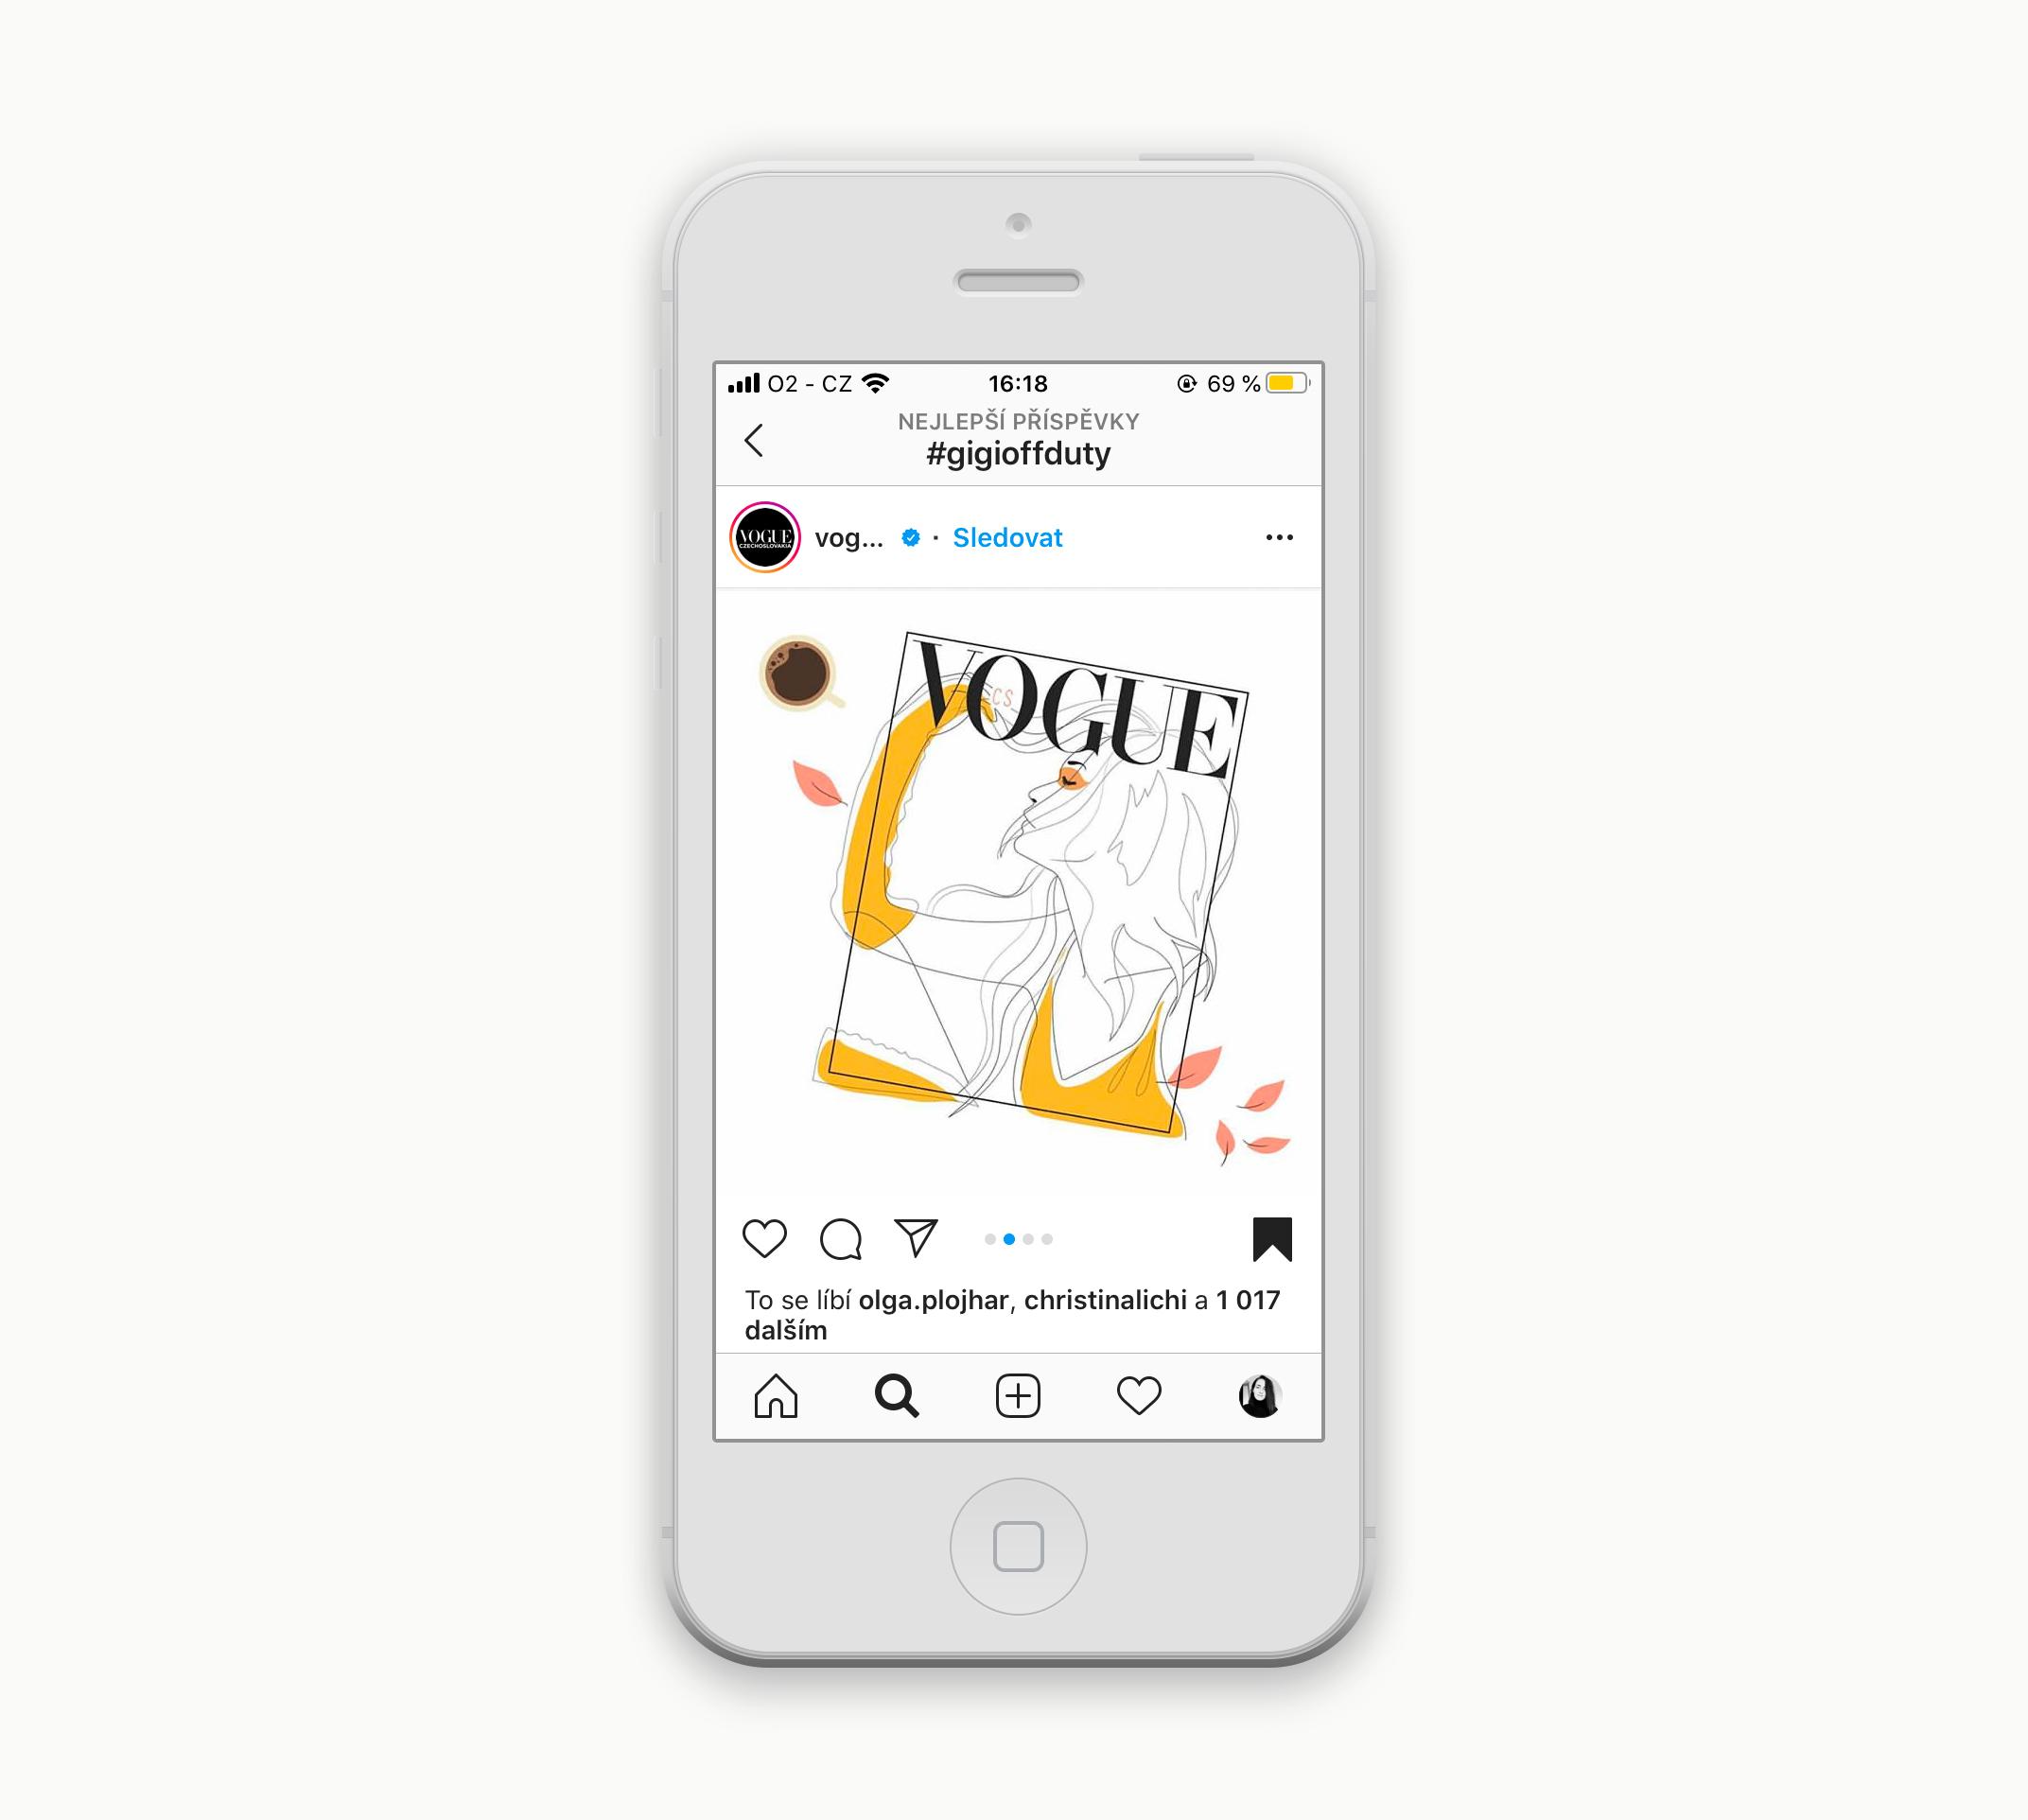 ilustratorkatka | Vogue